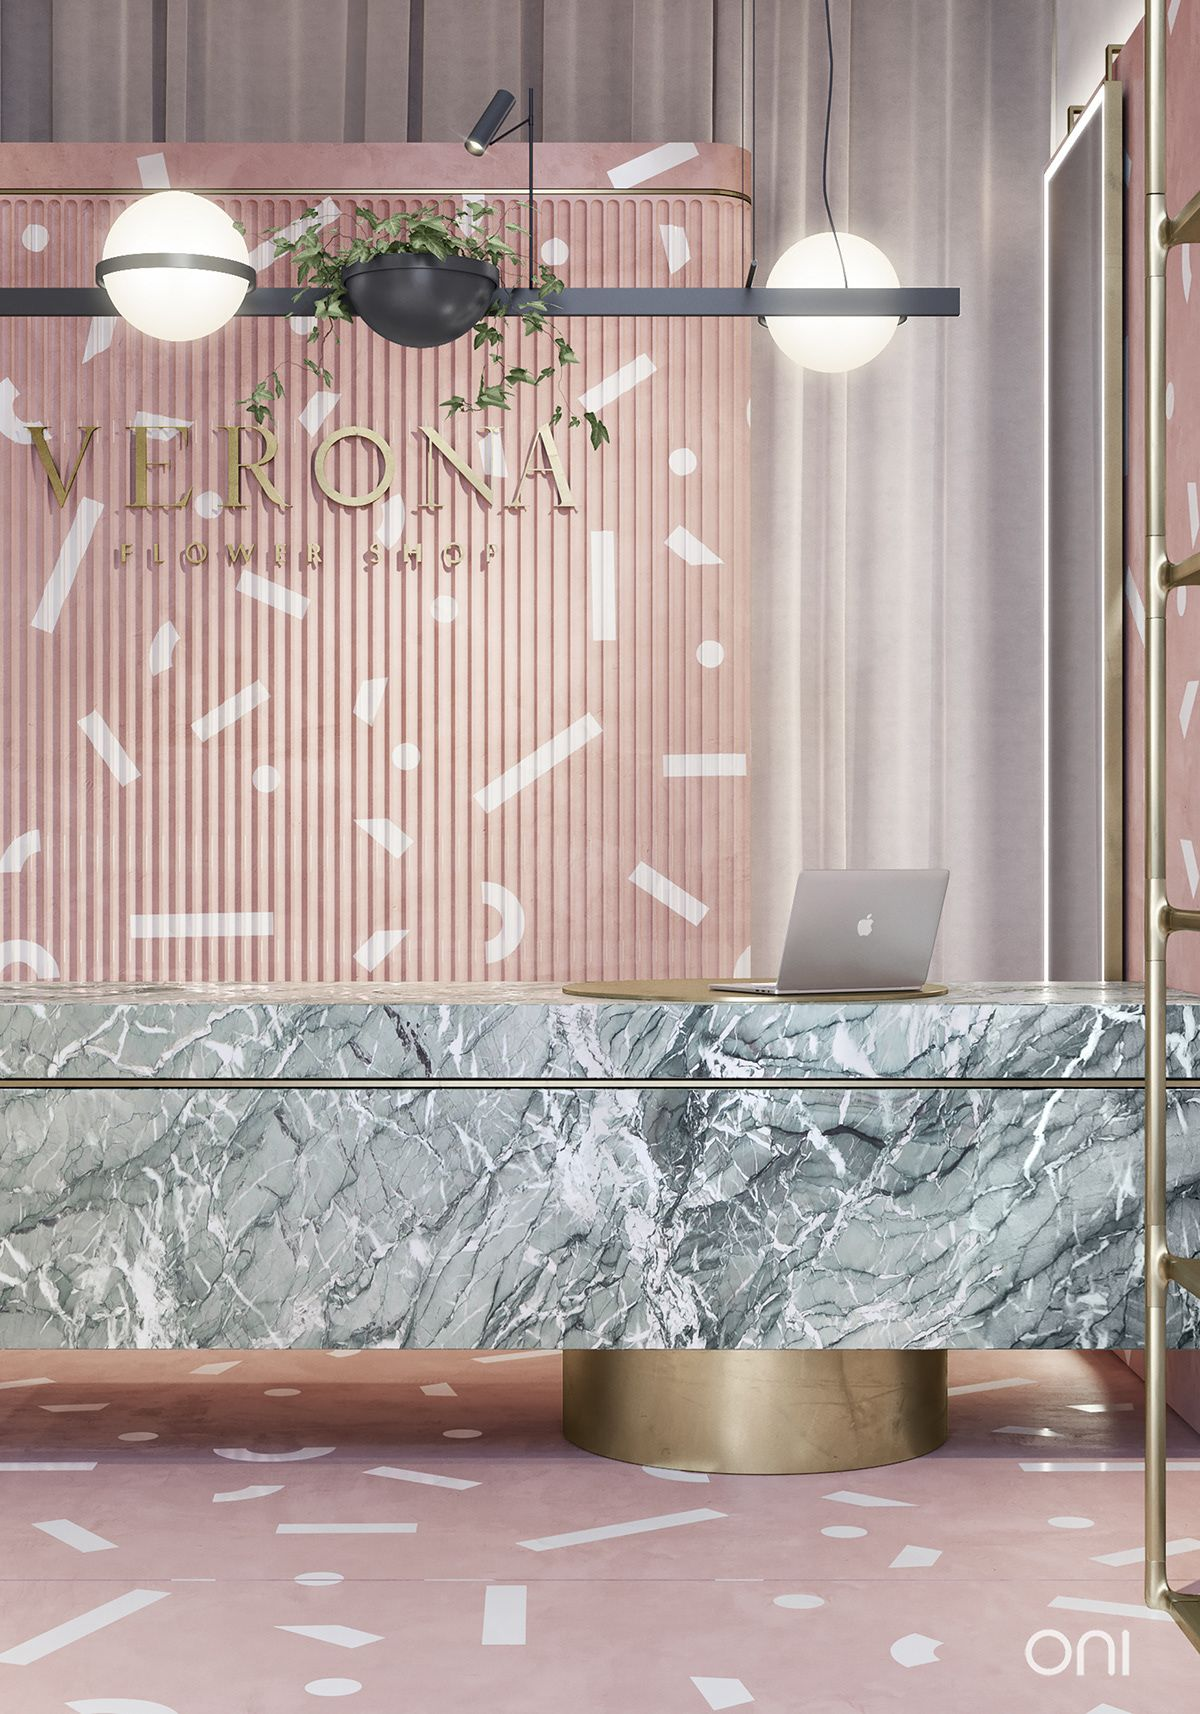 Verona Boutique On Behance Clinic Interior Design Lobby Design Salon Interior Design